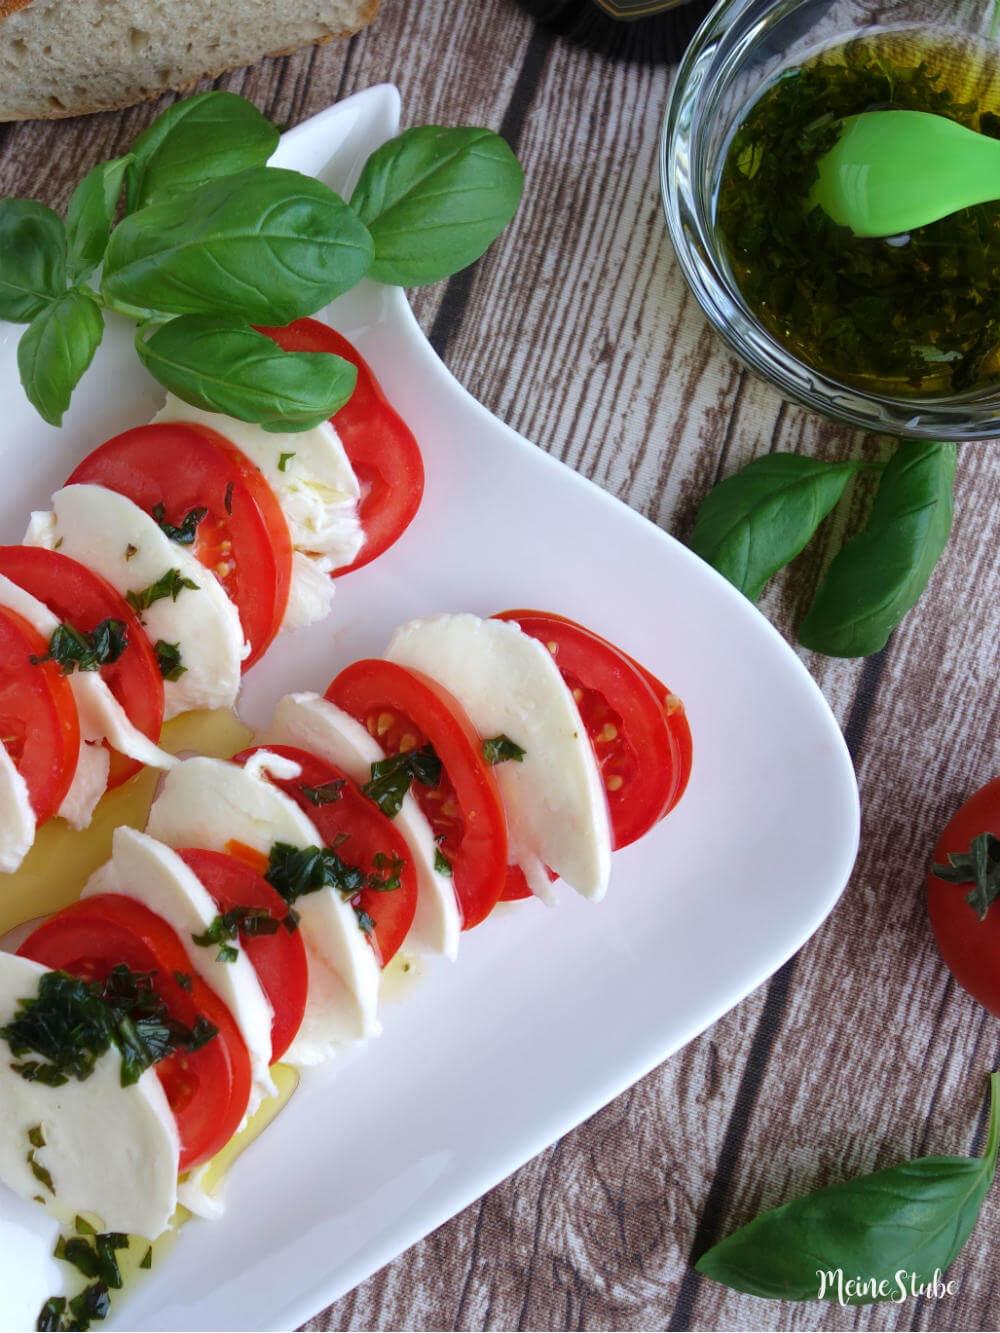 Tomaten-Mozzarella-Salat mit Olivenoel-basilikum-sauce